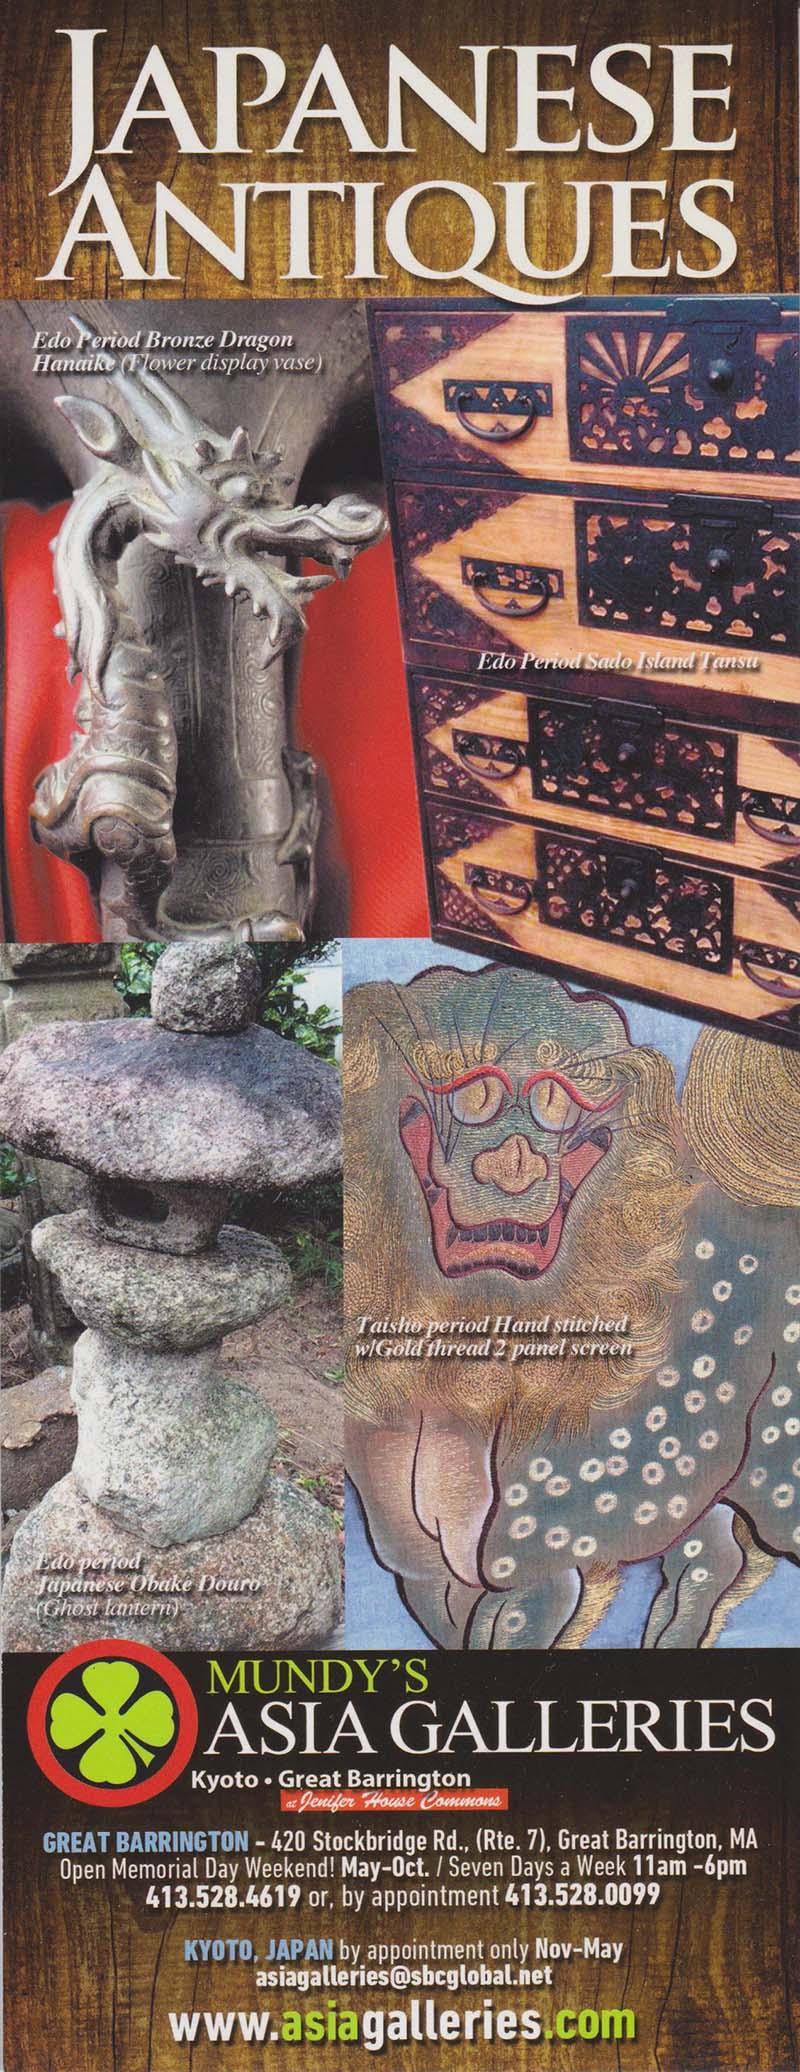 Mundy's Asia Galleries brochure thumbnail